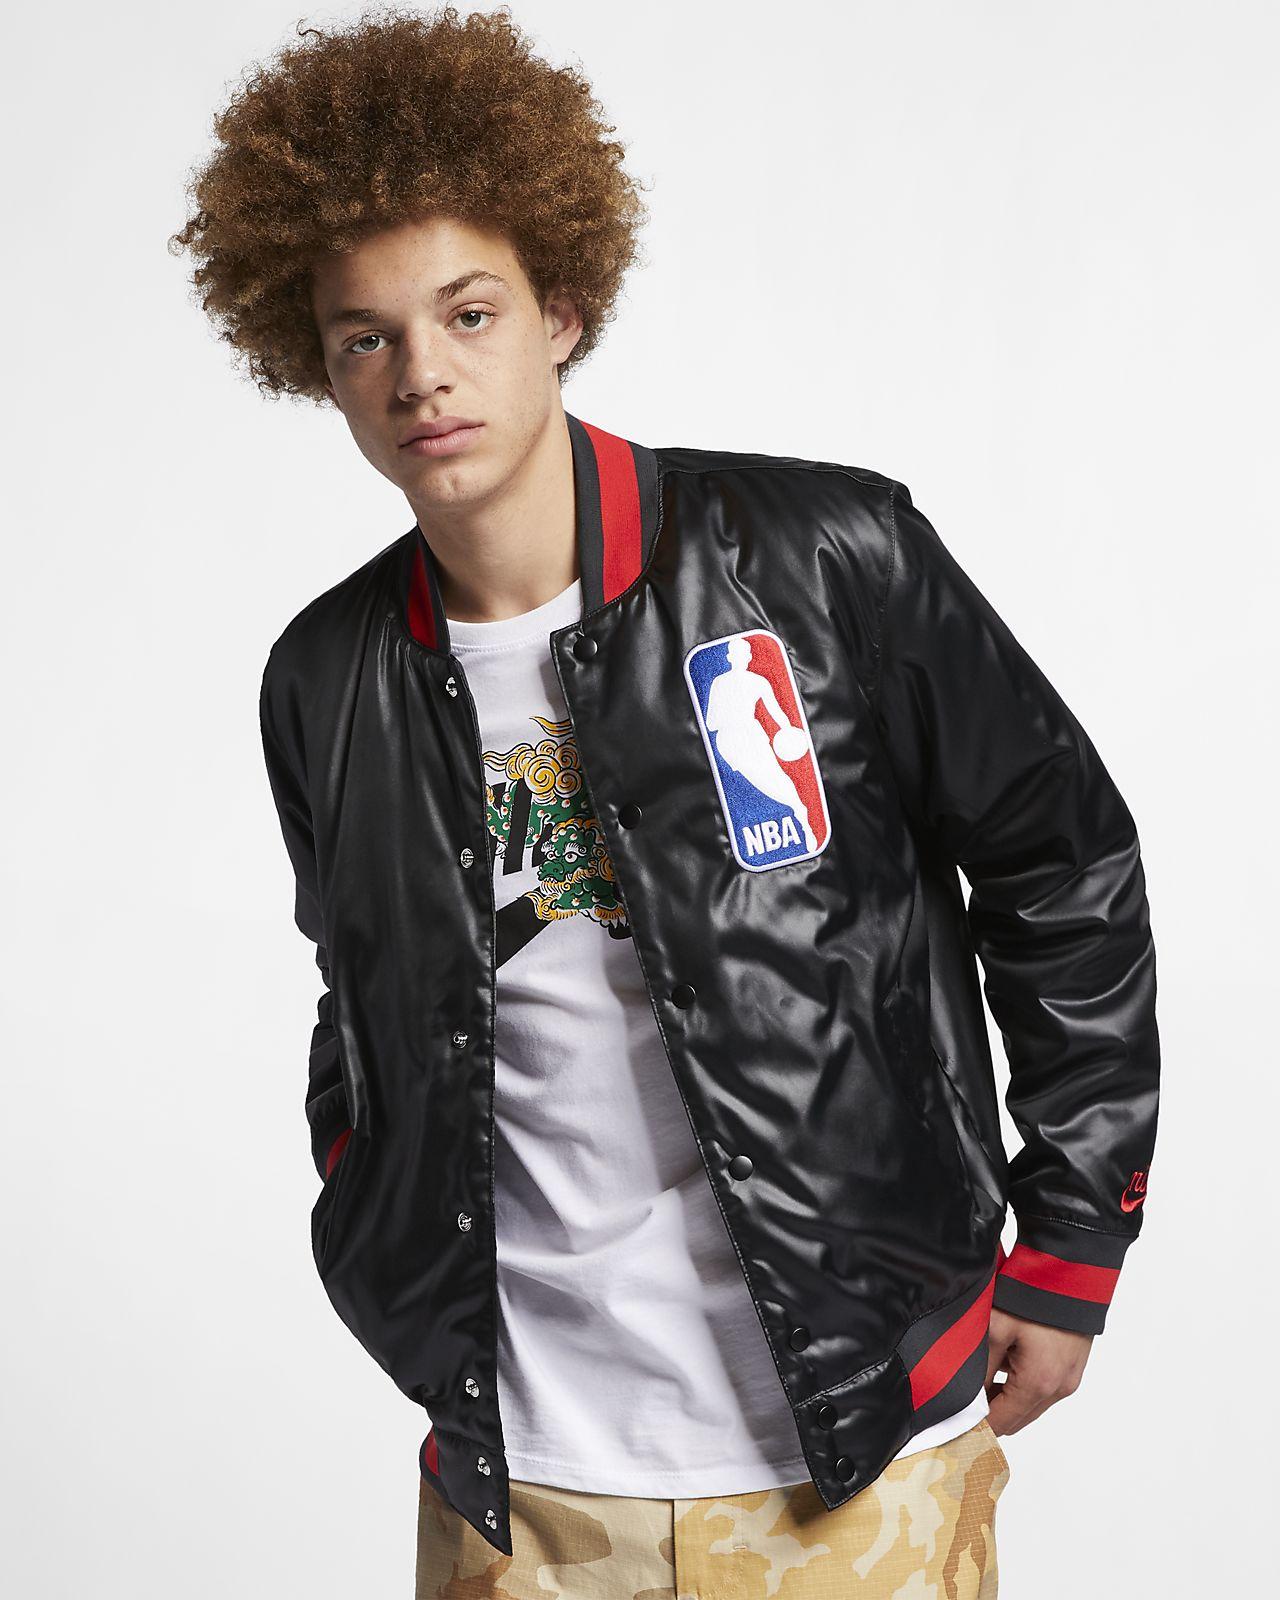 Nike SB x NBA Herren-Bomberjacke